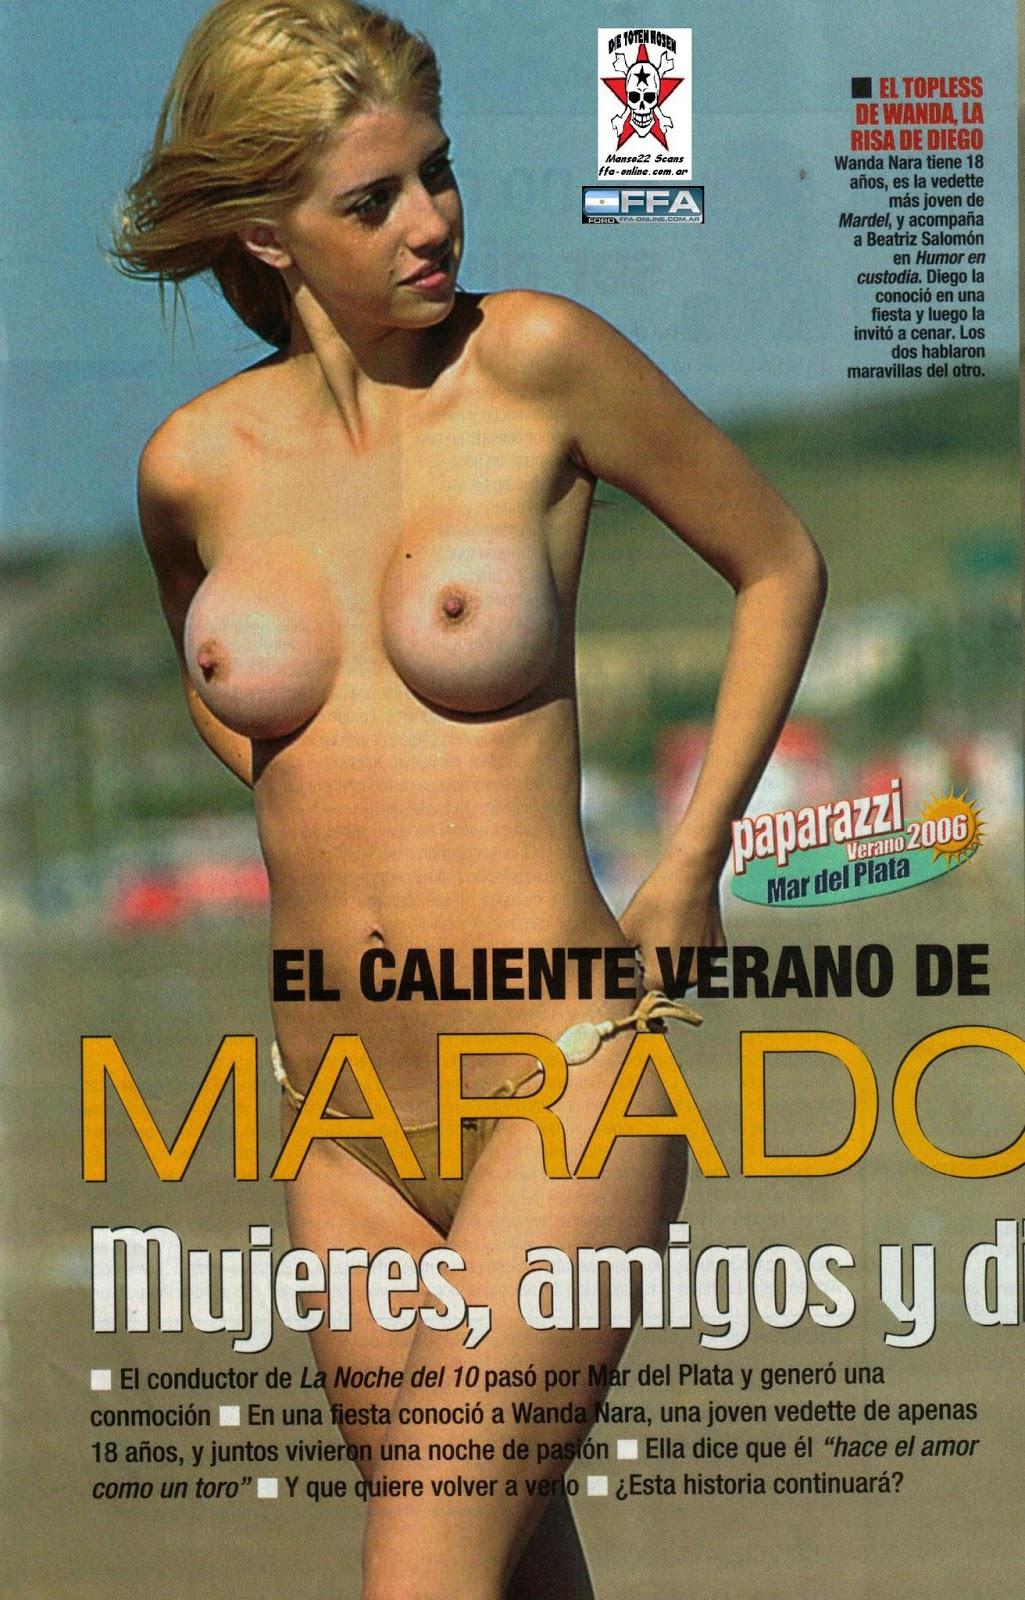 Wanda Nara Haciendo Topless En La Playa Imagenes Hq